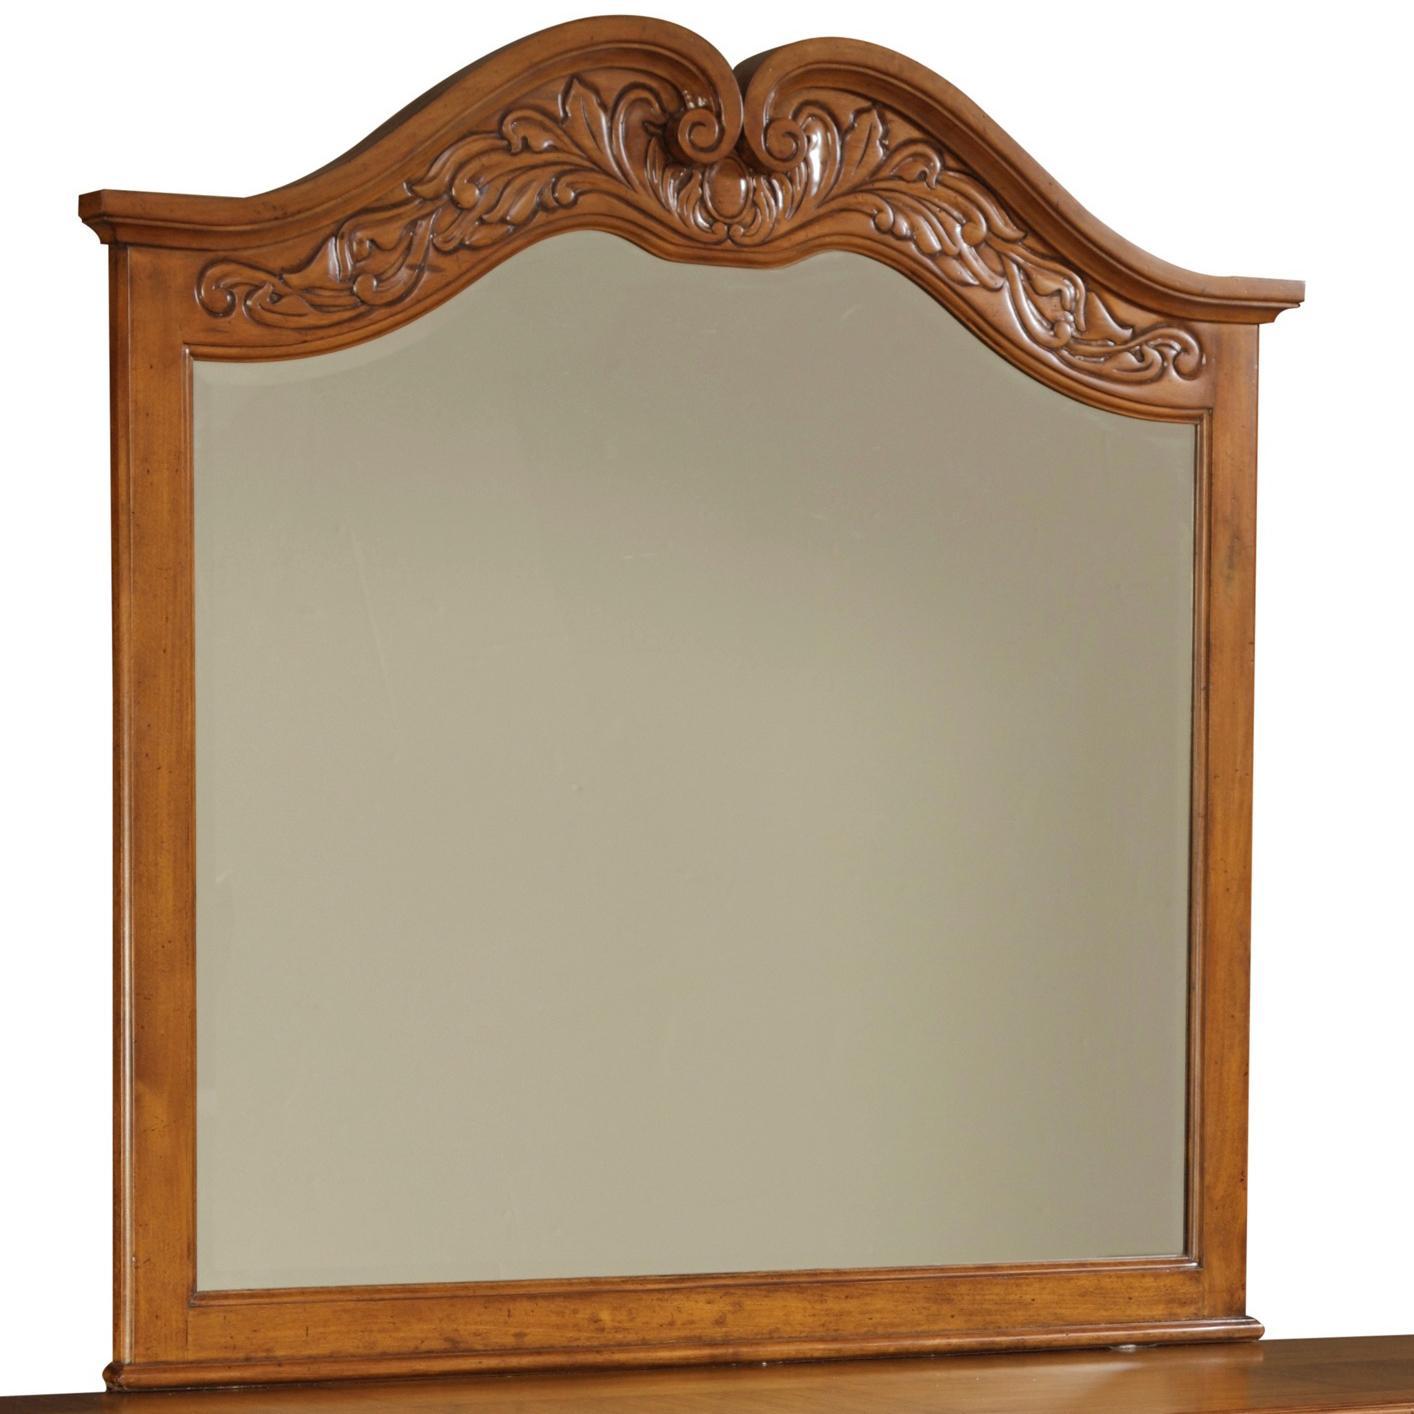 Broyhill Furniture Samana Cove Dresser Mirror - Item Number: 4702-237